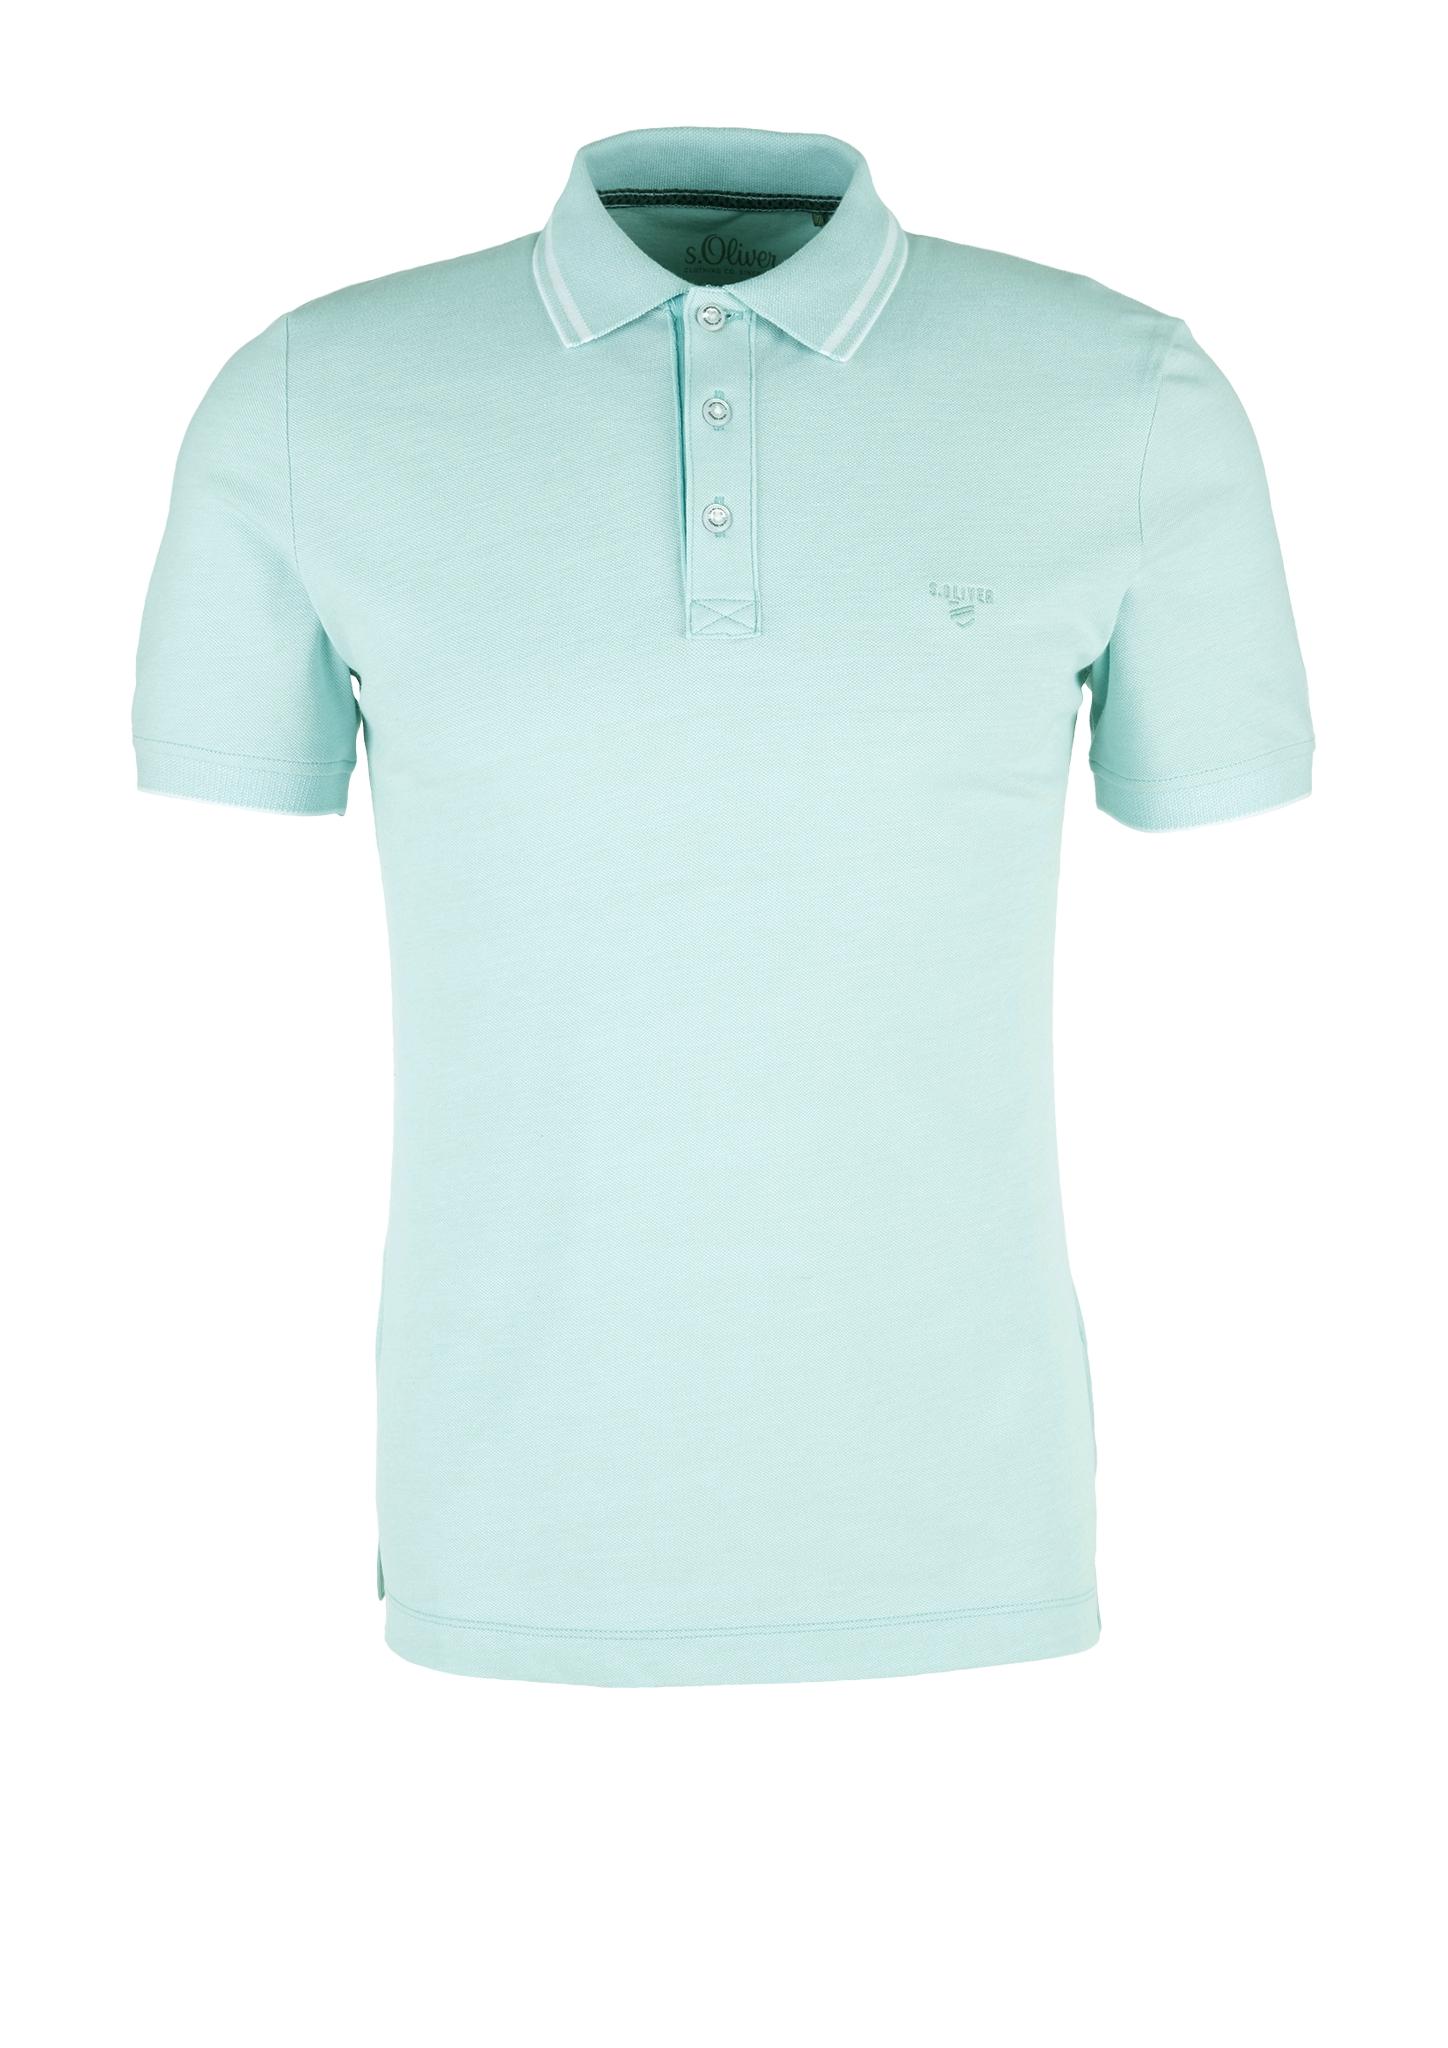 Melange-Poloshirt | Bekleidung > Polo Shirts > Langarm | Türkis | 97% baumwolle -  3% elasthan | s.Oliver